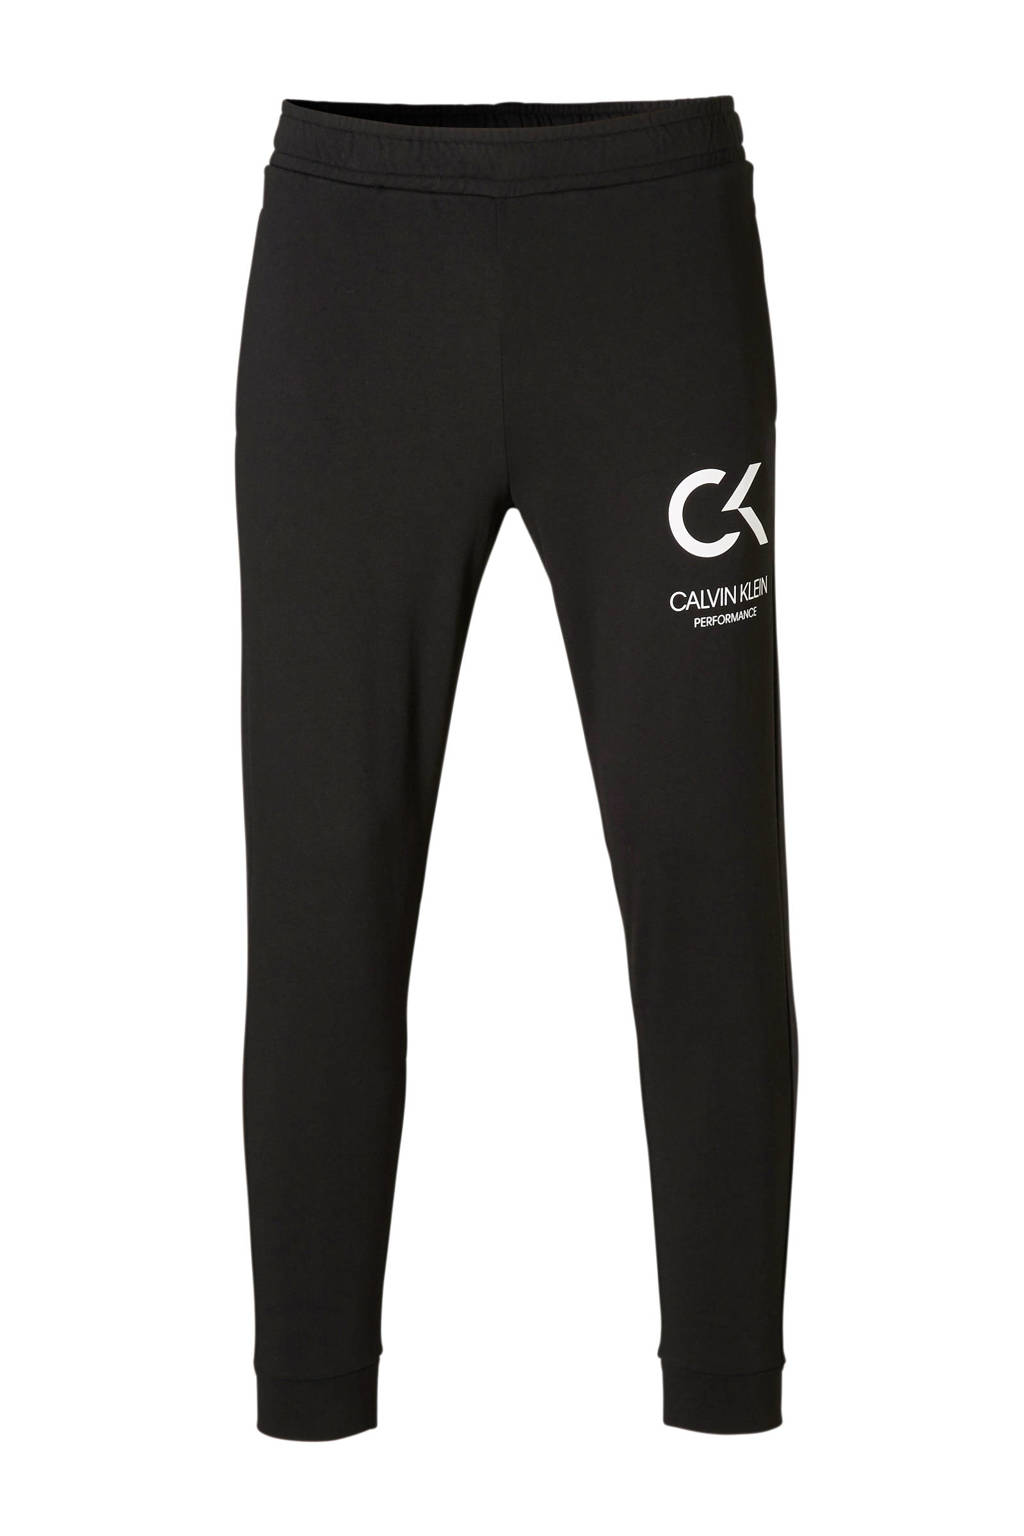 Calvin Klein Performance 7/8 joggingbroek, Zwart/wit